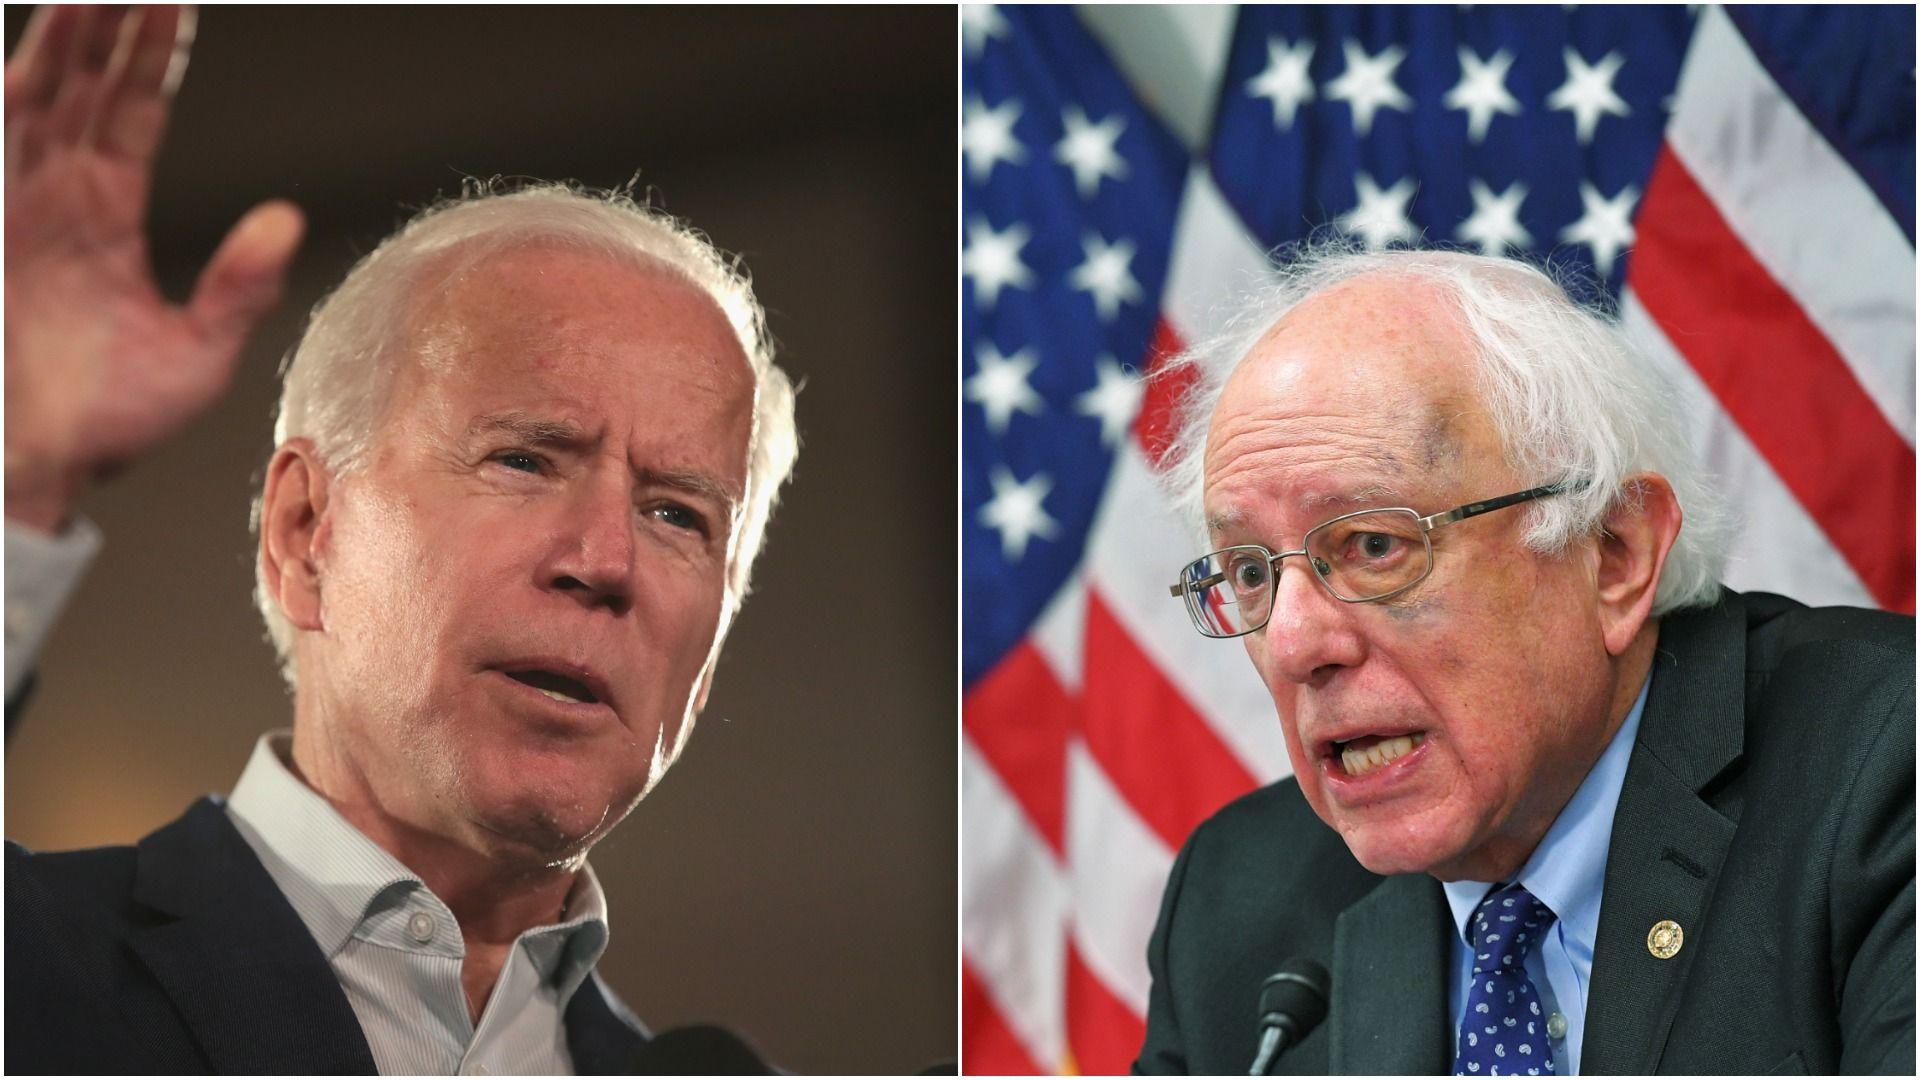 Biden and Bernie Sanders